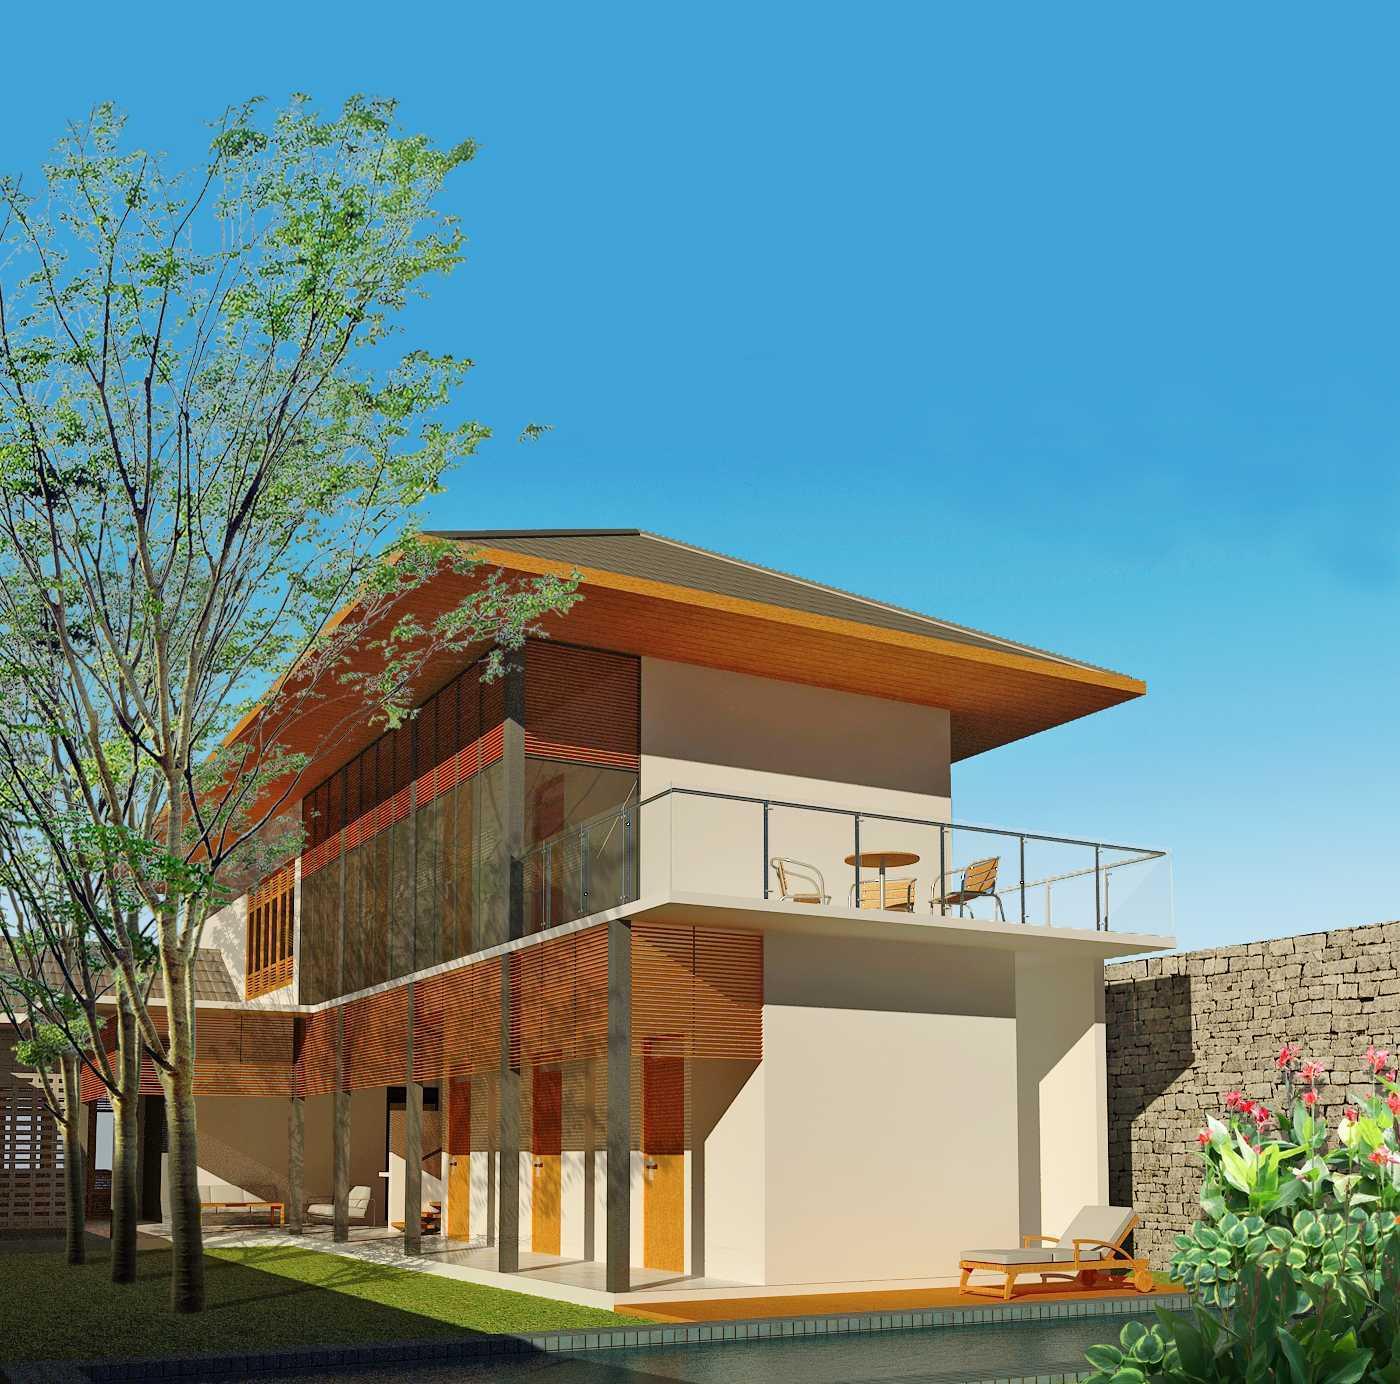 Rerupa Architecture Gito Gati House Yogyakarta, Yogyakarta City, Special Region Of Yogyakarta, Indonesia Yogyakarta City, Special Region Of Yogyakarta, Indonesia Fix-Arief-14C   32784